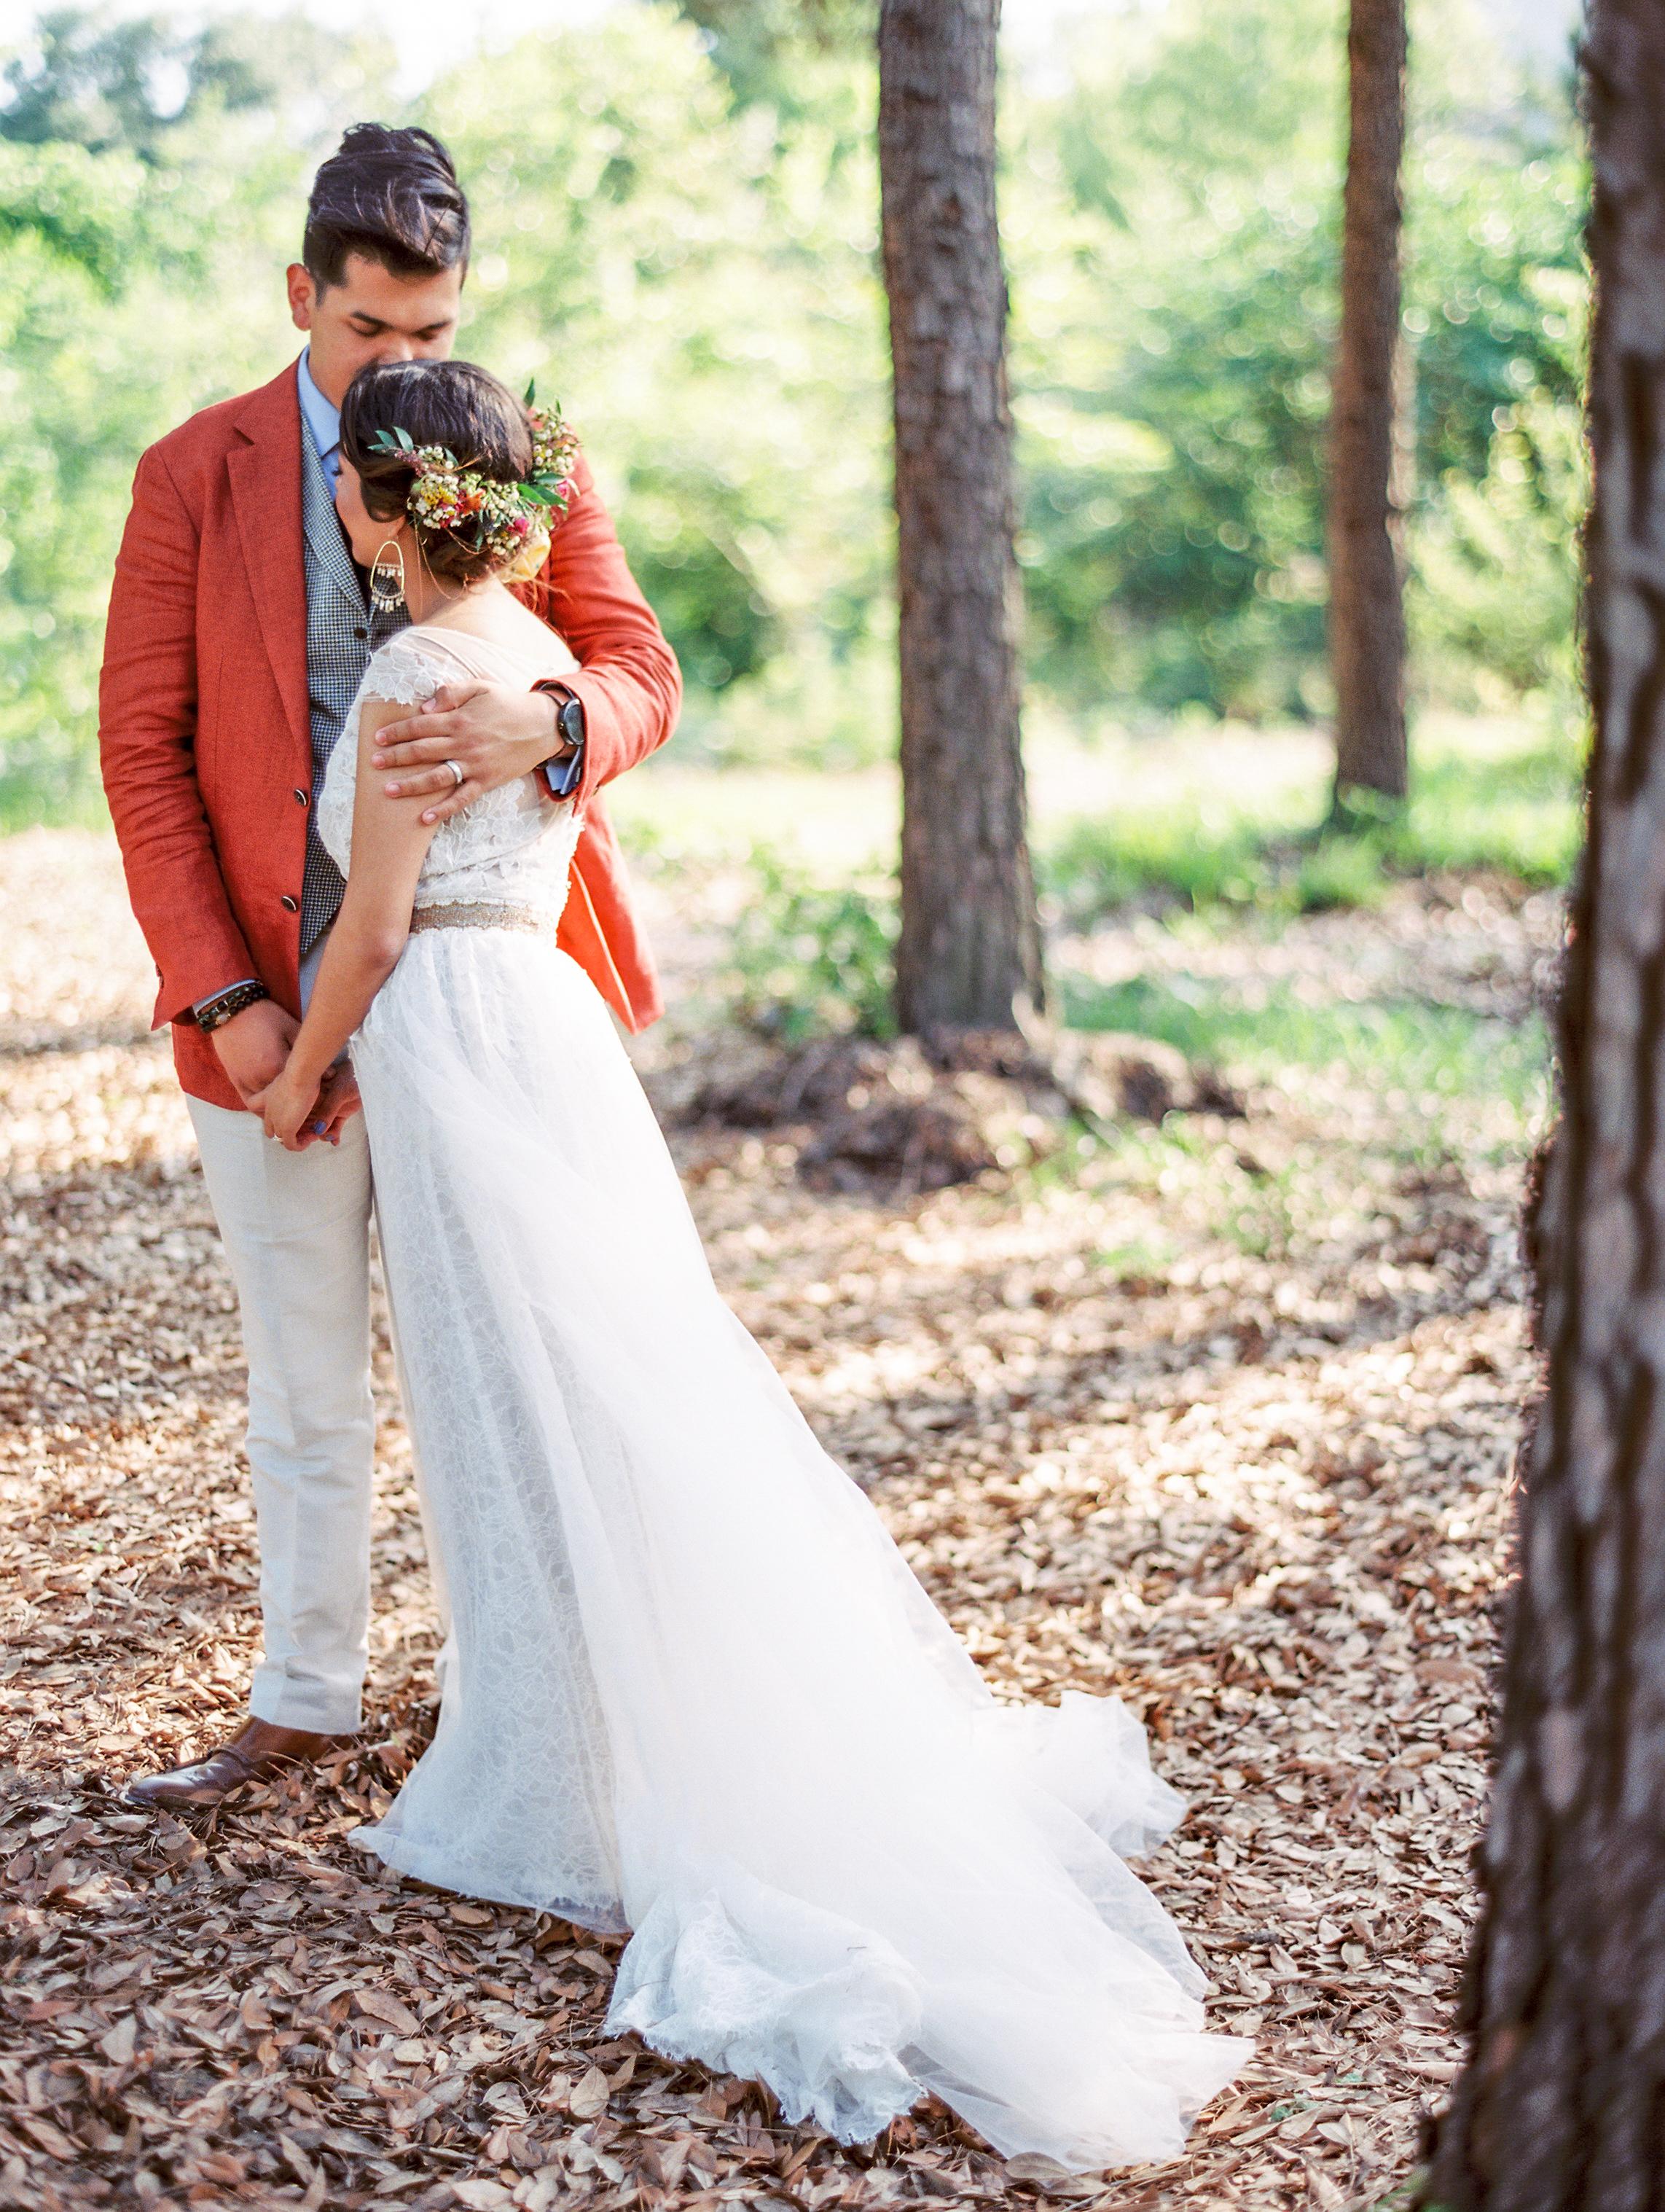 Dana-Fernandez-Photography-Martha-Stewart-Weddings-Houston-Texas-Wedding-Photographer-Film-20.jpg